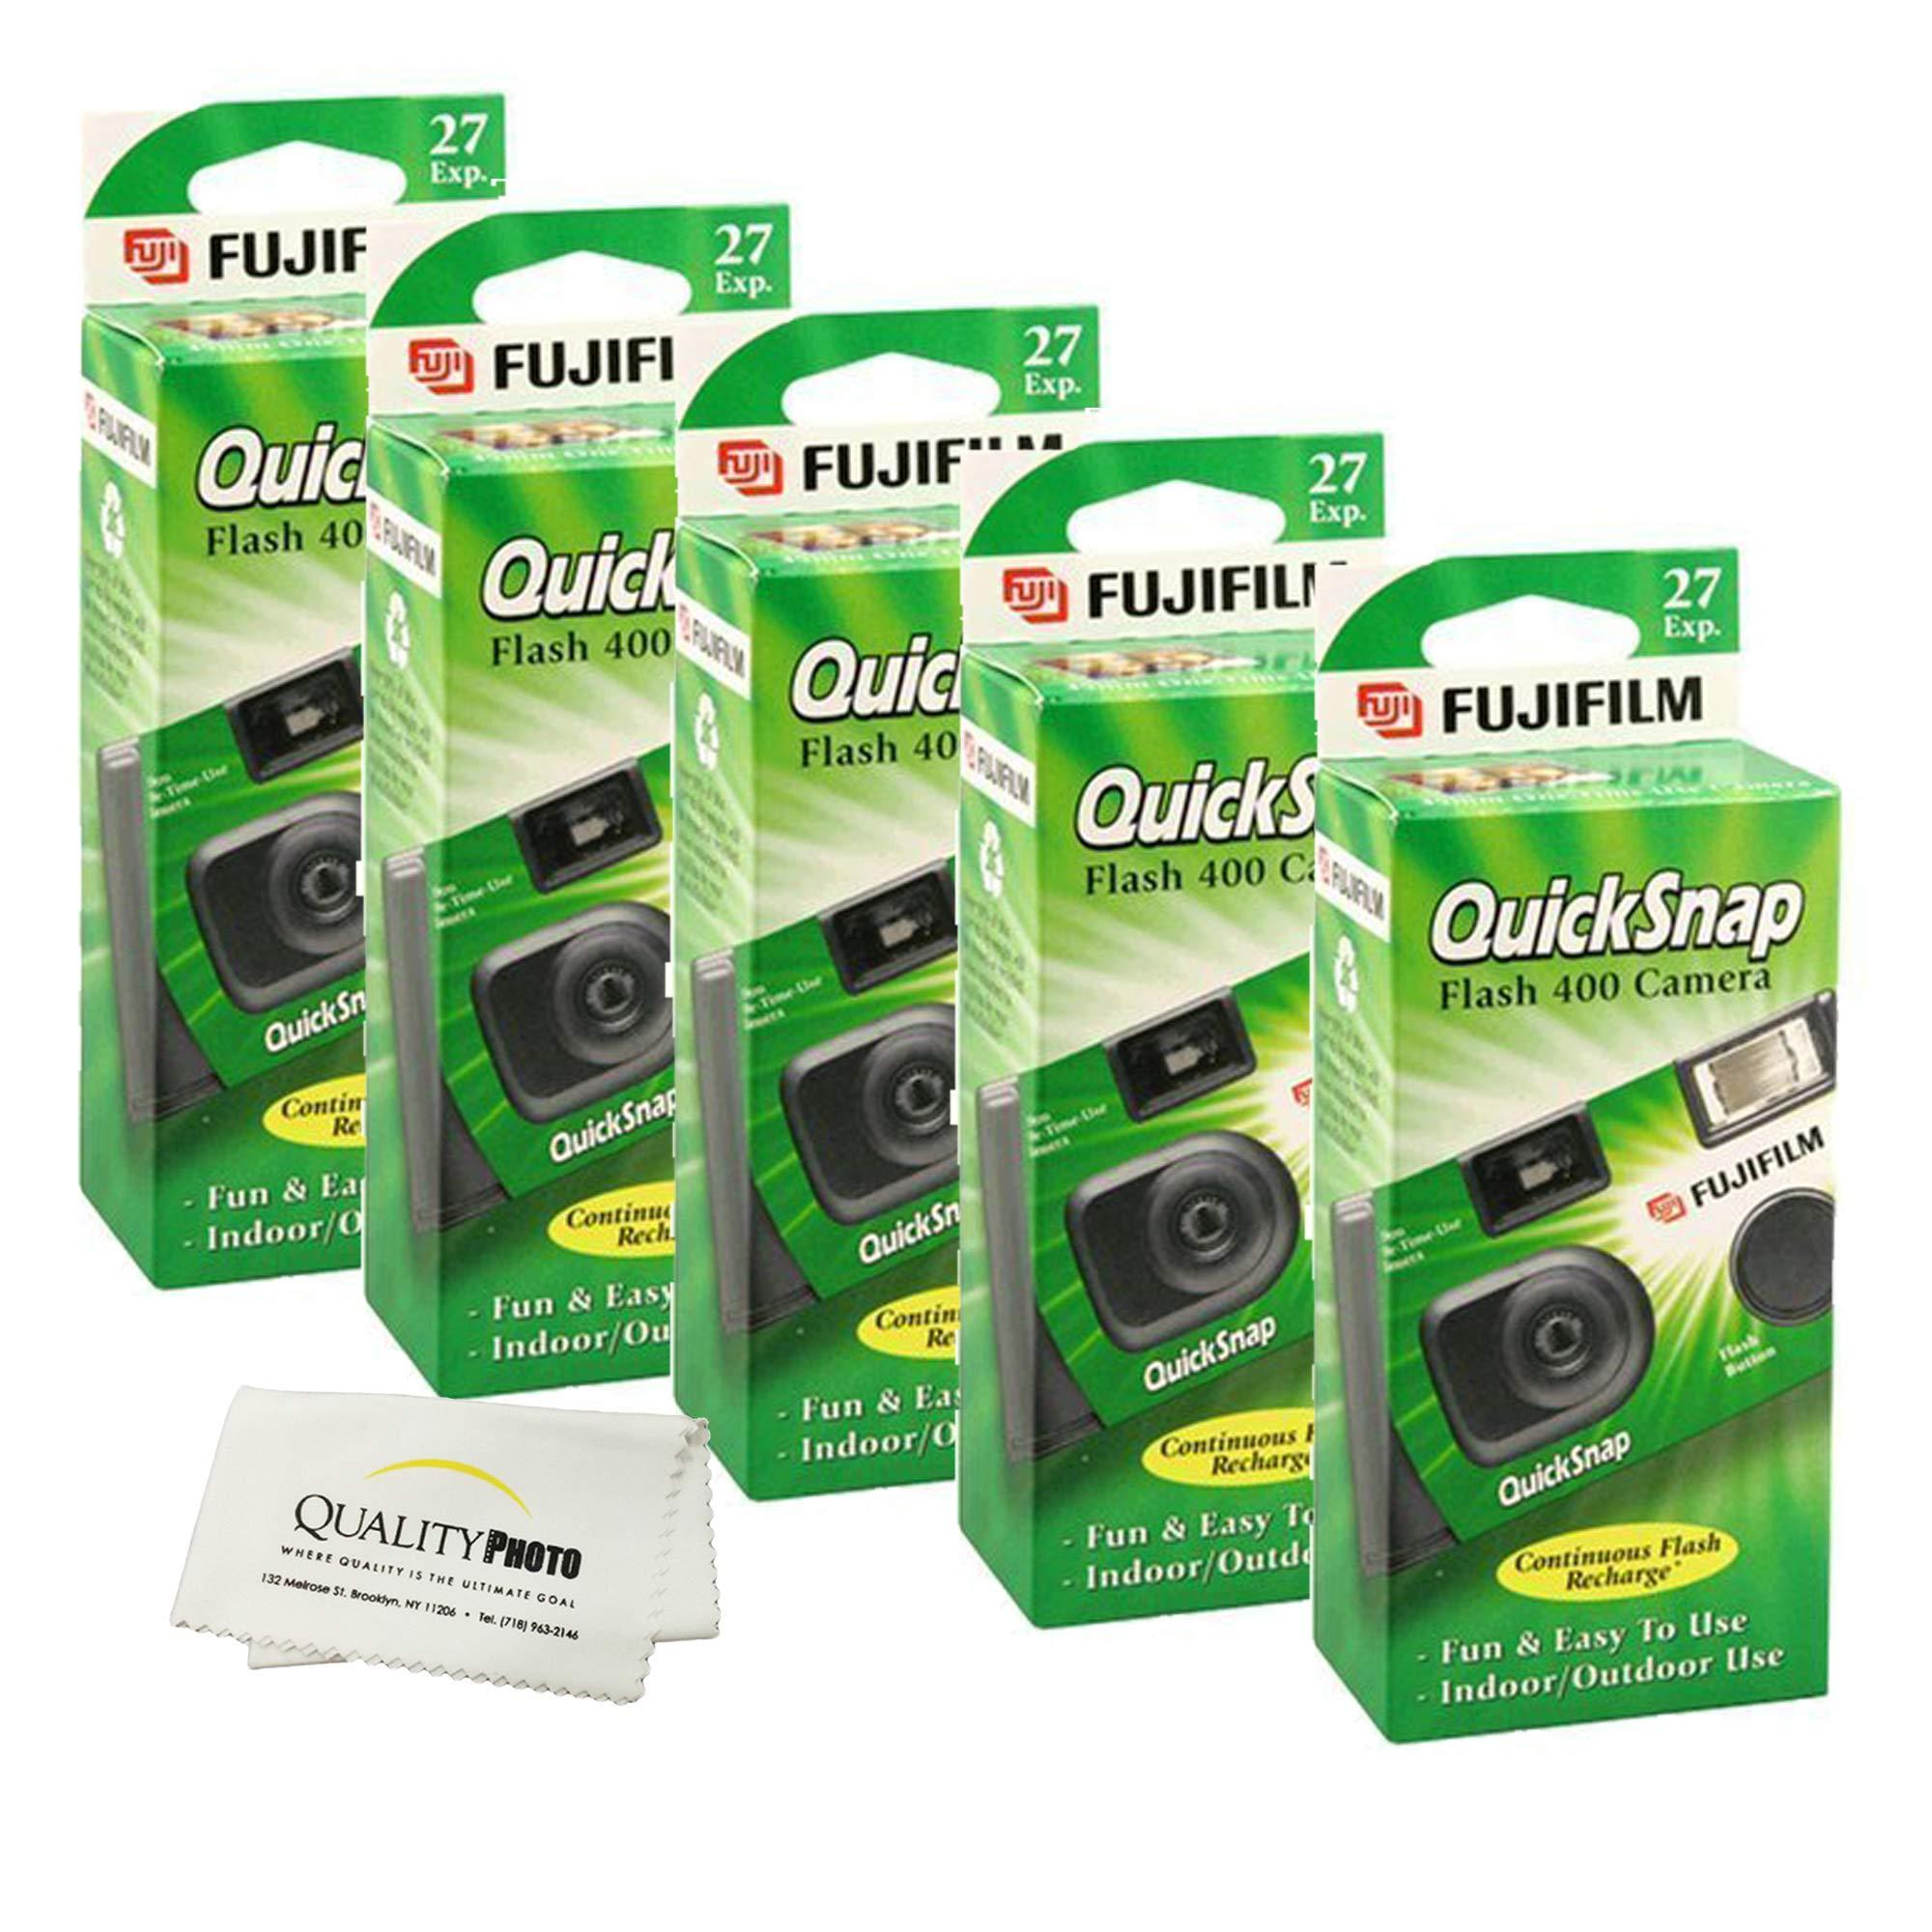 Fujifilm QuickSnap Flash 400 Disposable 35mm Camera + Quality Photo Microfiber Cloth (5 Pack)